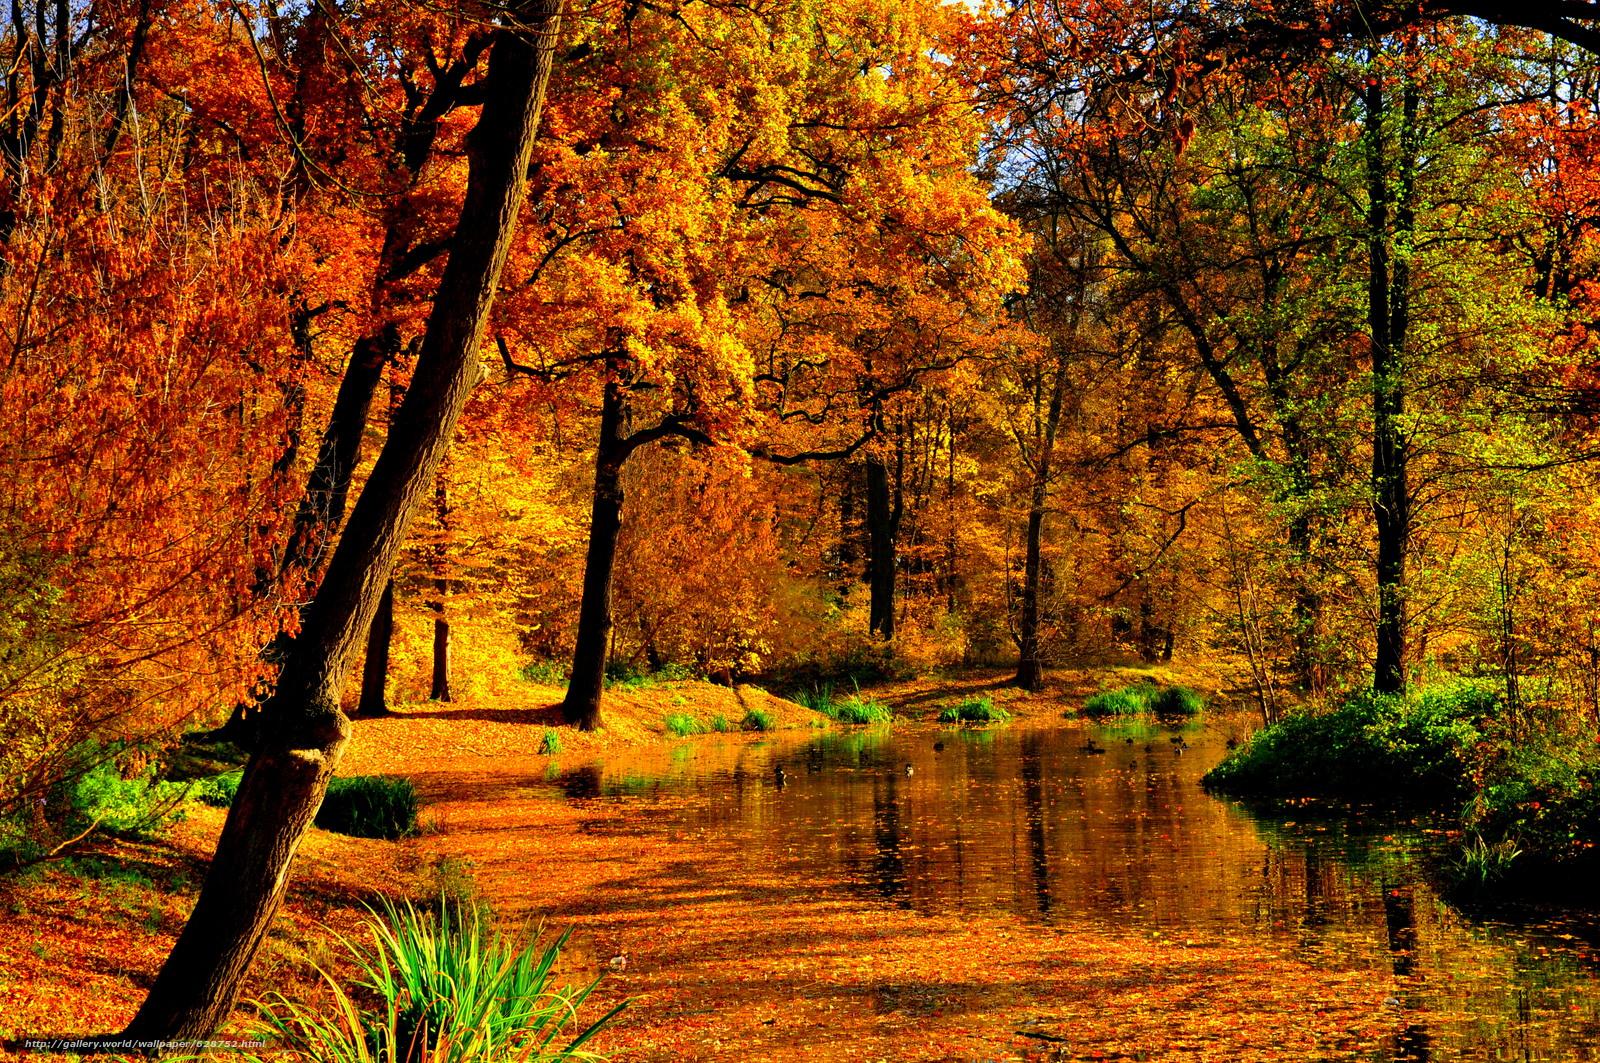 осень, лес, пруд, деревья, пейзаж